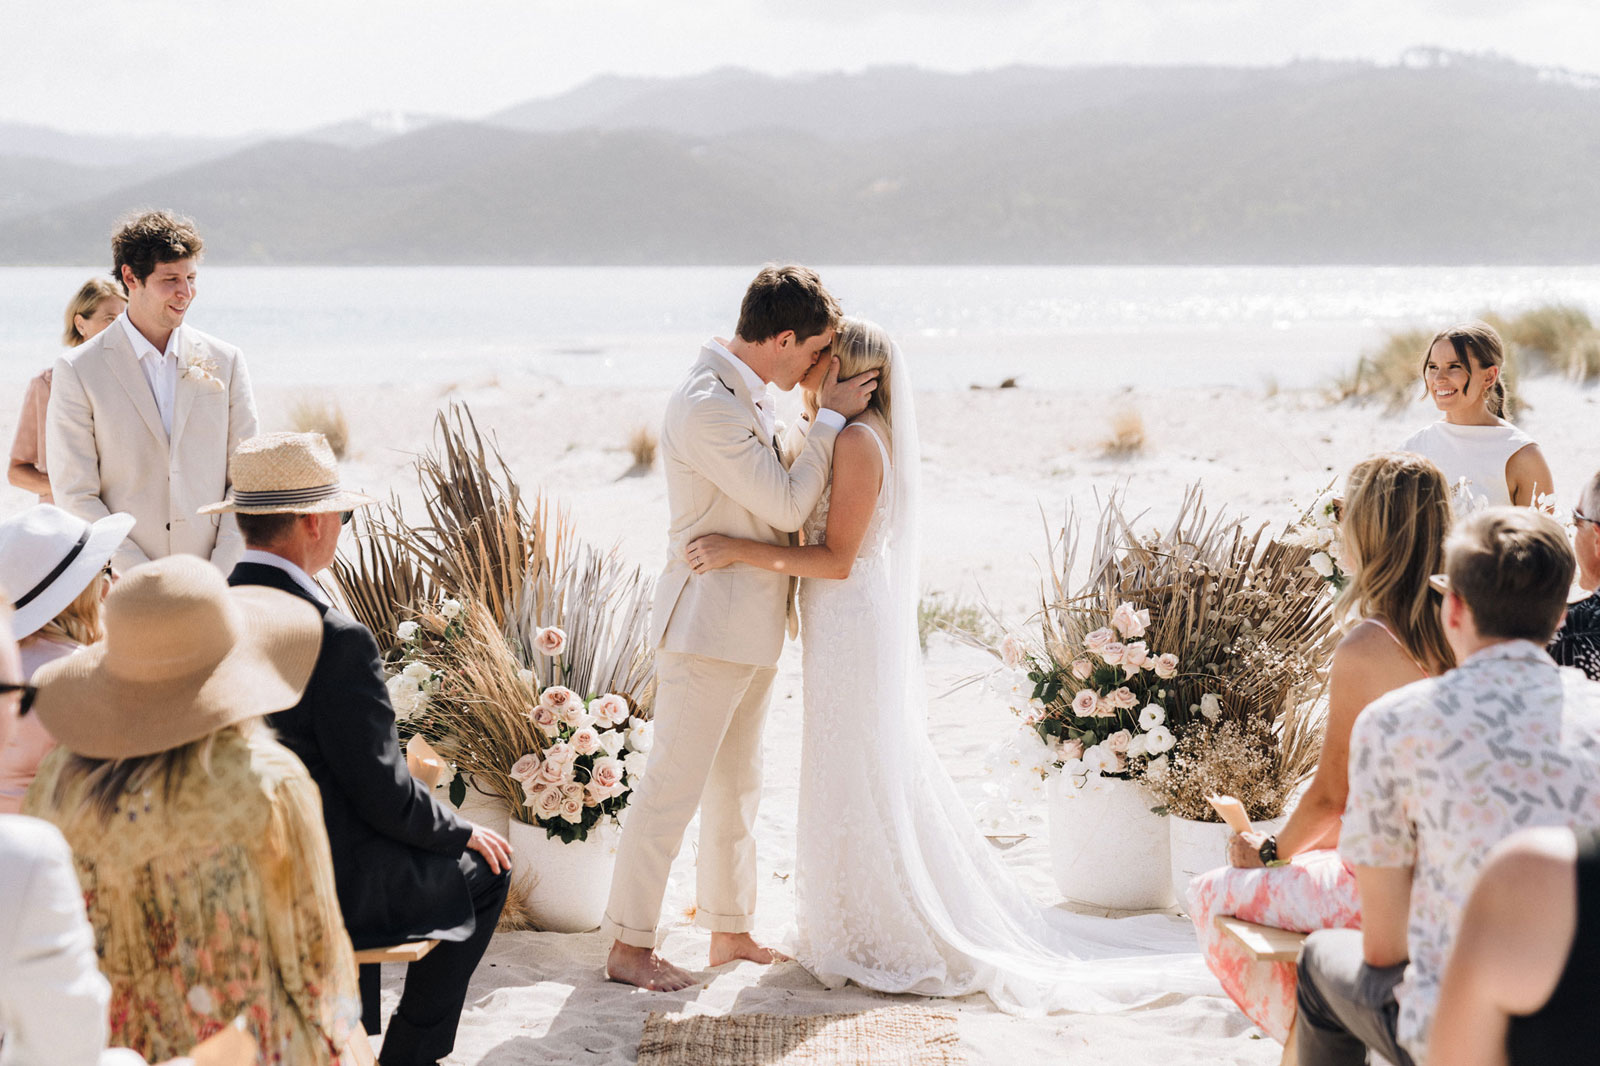 newfound-k-b-coromandel-wedding-photographers-062